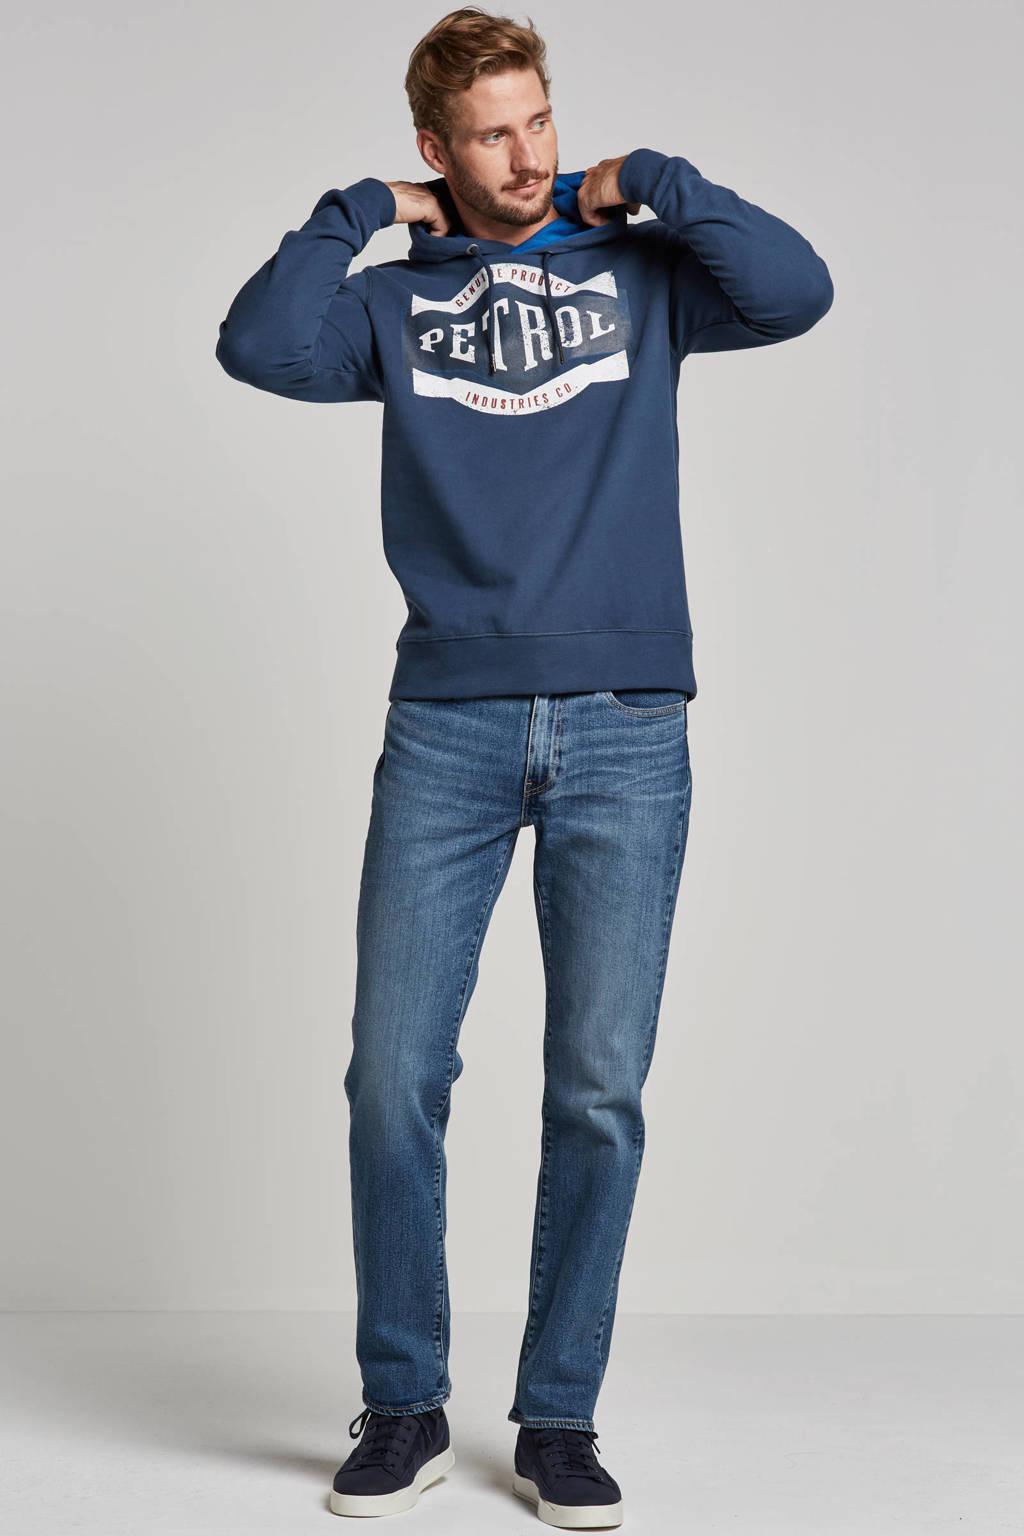 Levi's 514 straight fit jeans, Brick Road T2